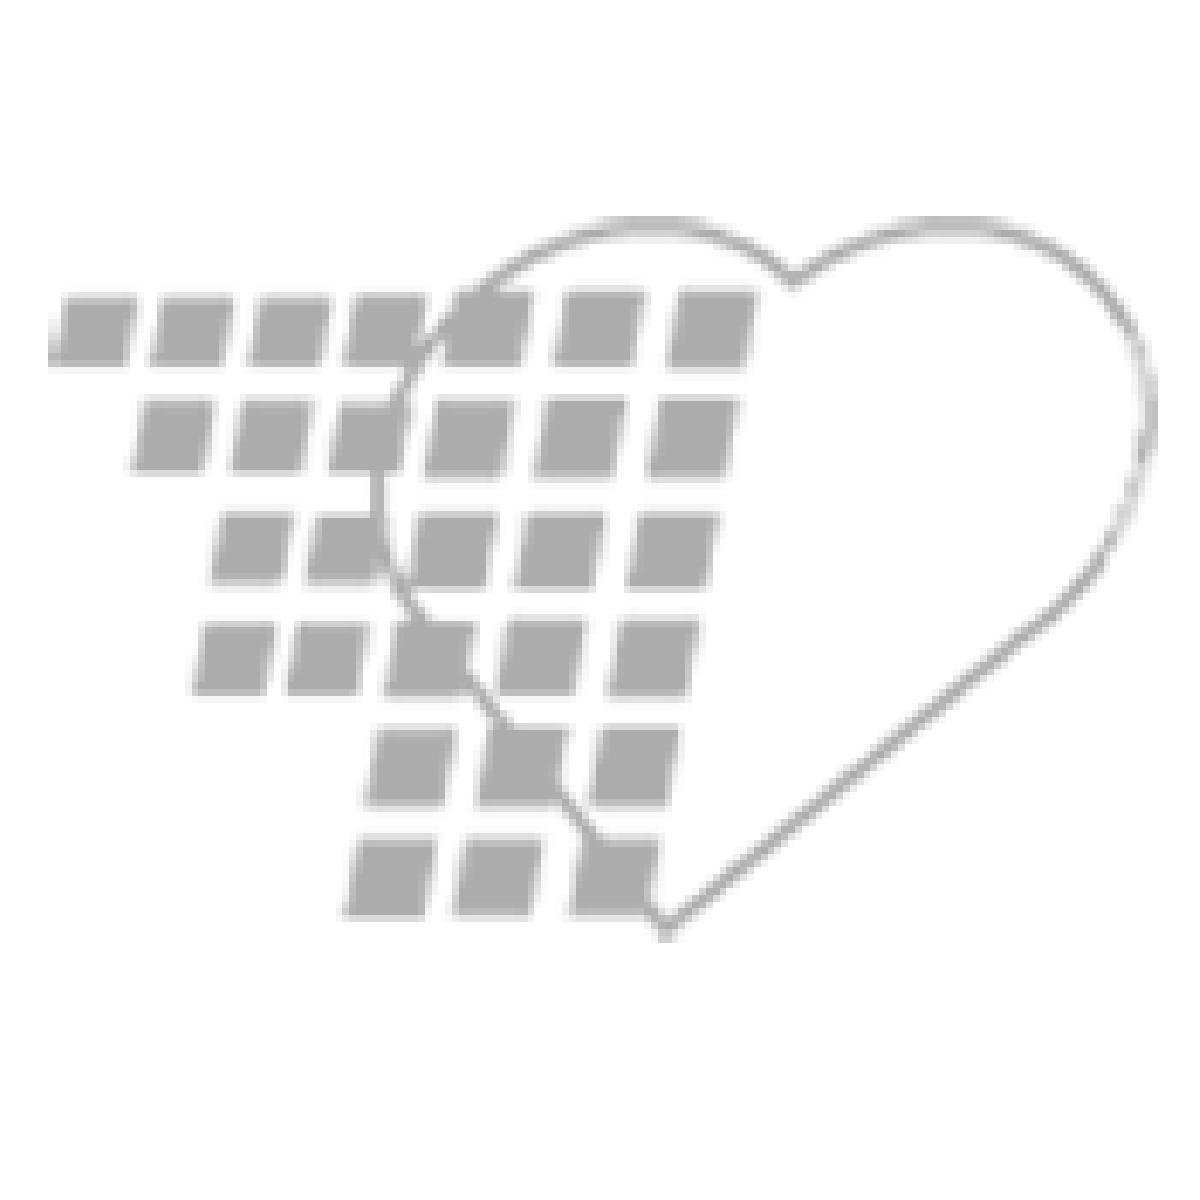 06-21-505P Multi-Sample (Blood Draw) Needle